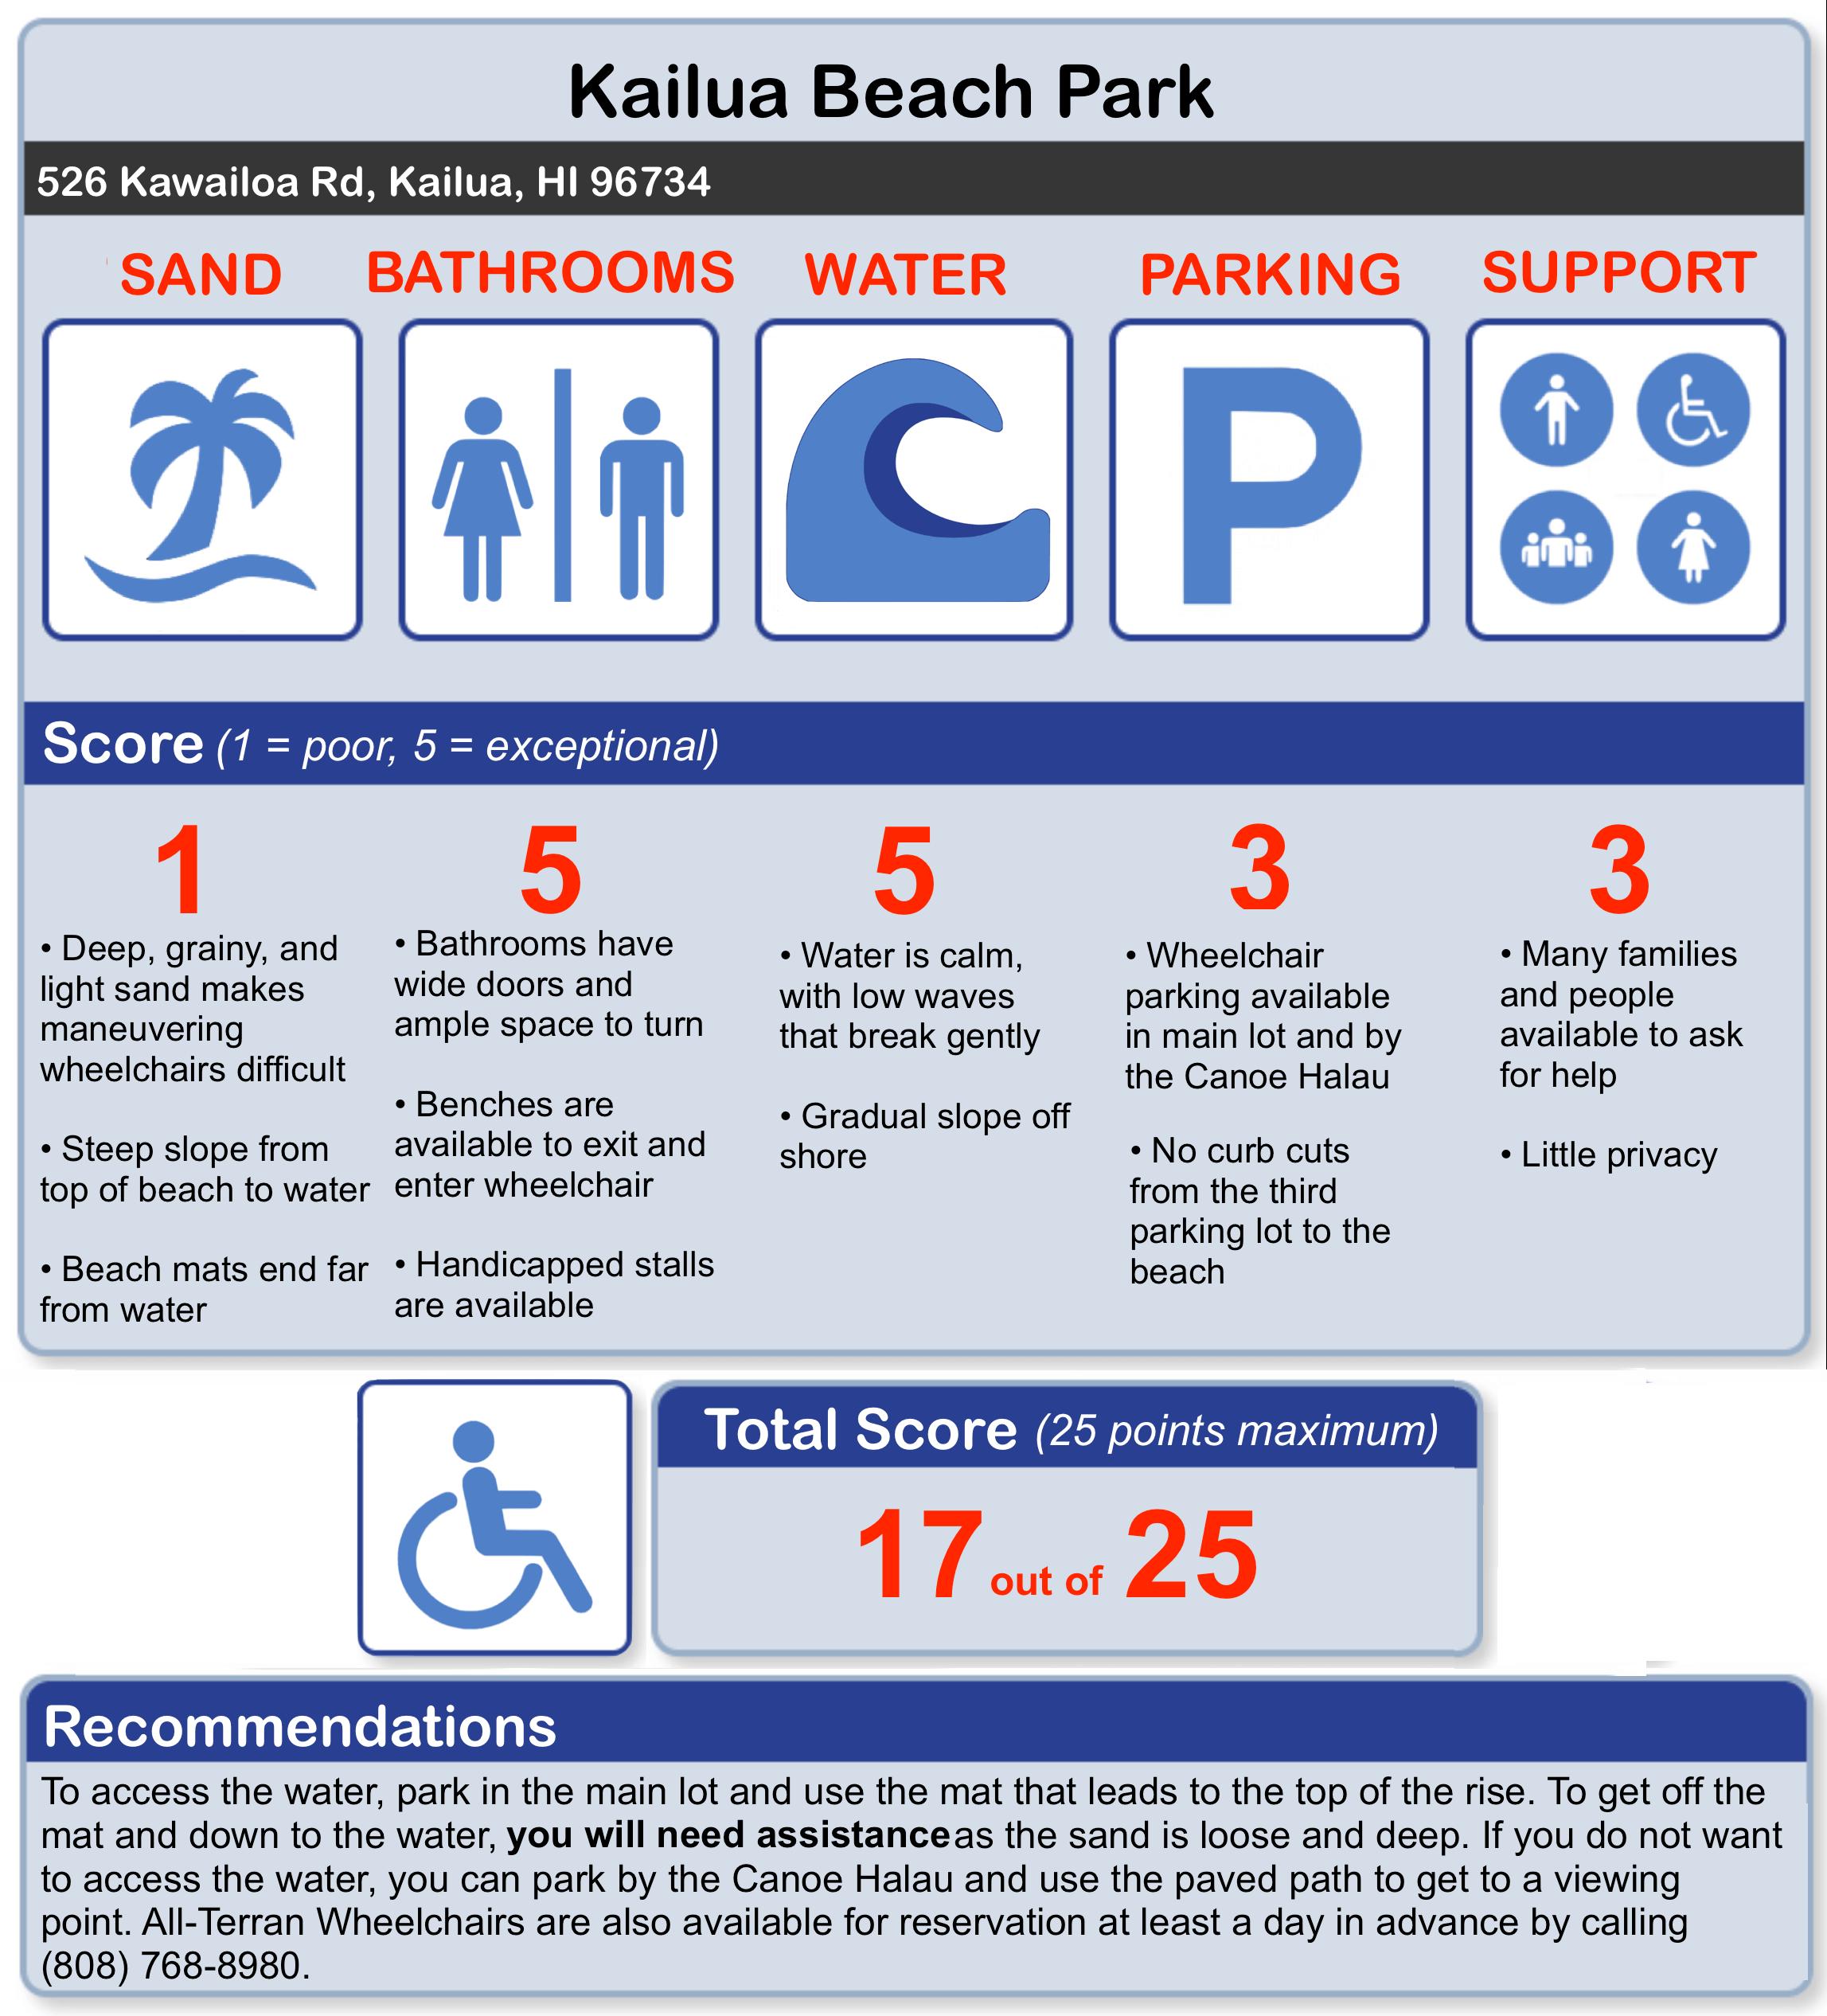 Kailua Beach Park Accessibility Guide